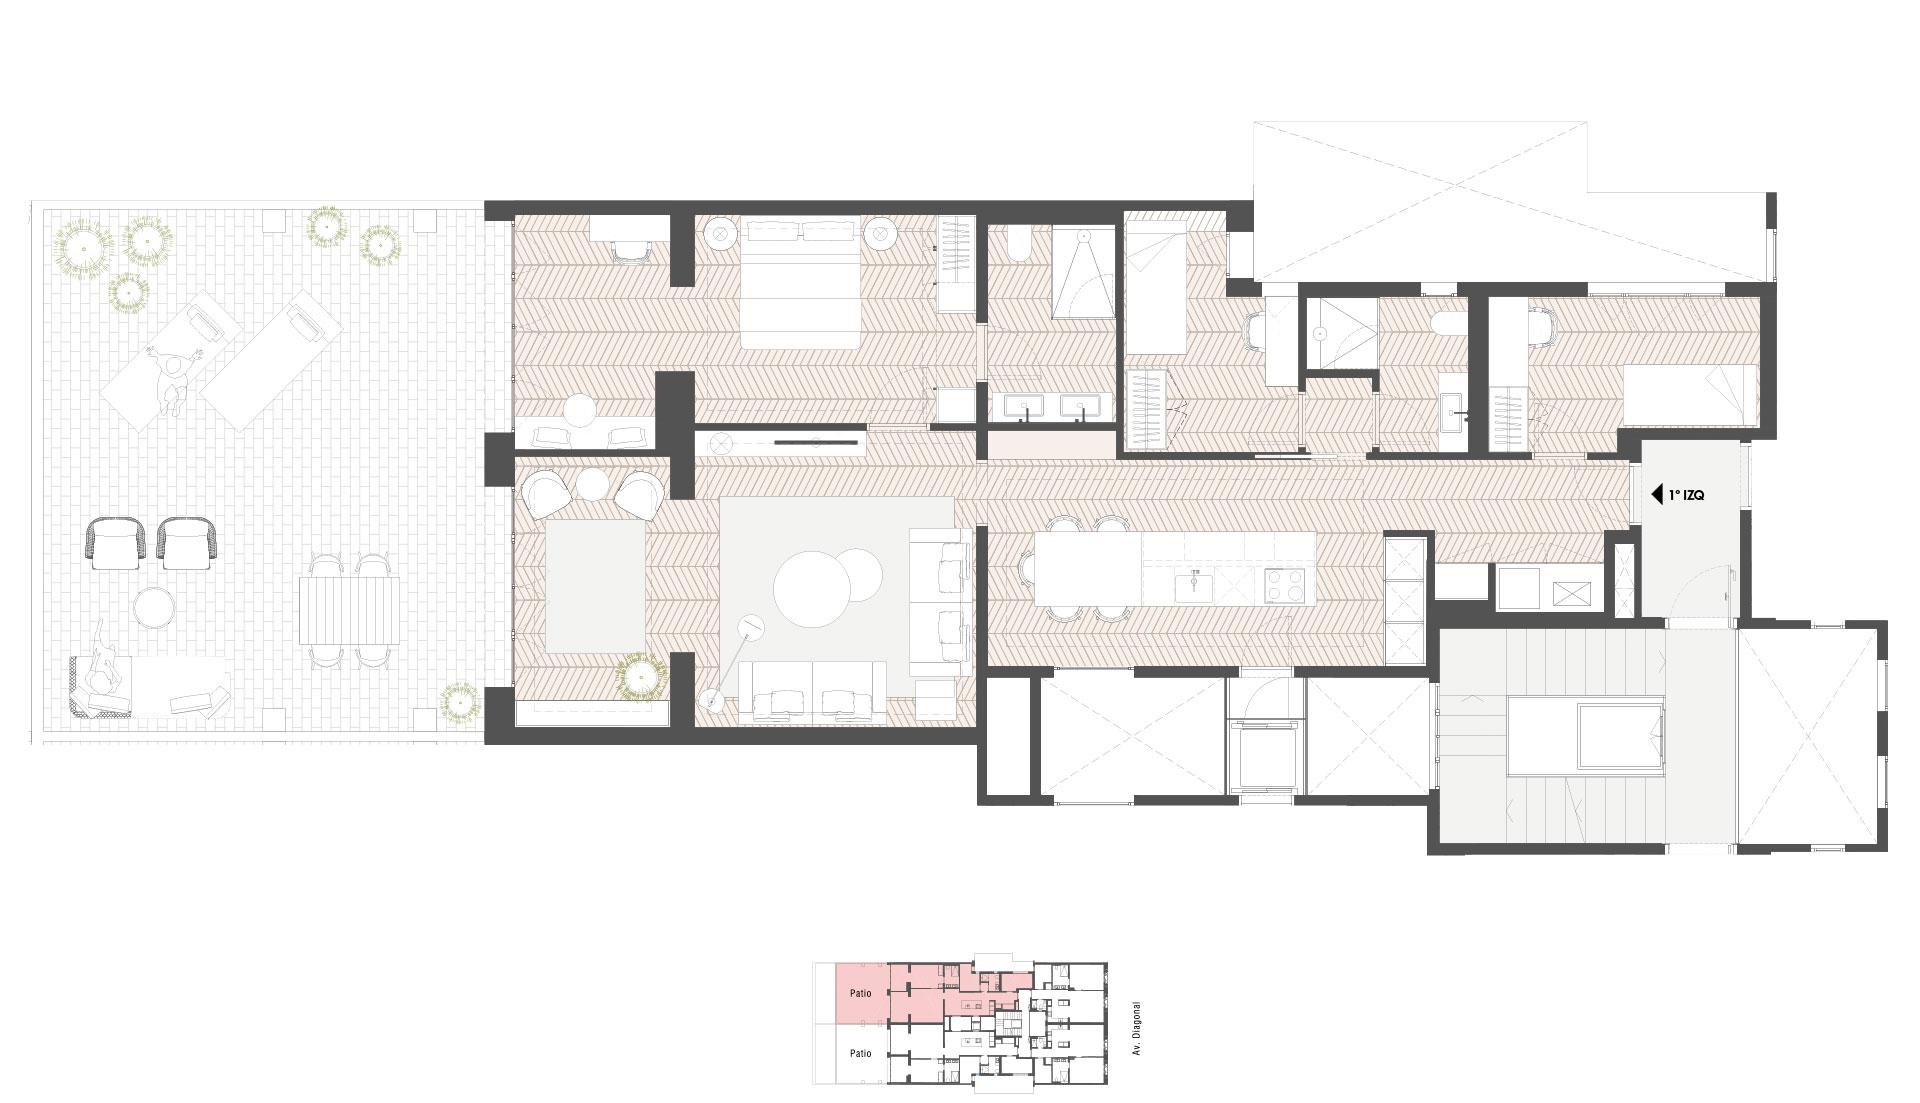 Torre Diagonal 331 - Entresuelo 1 Izq